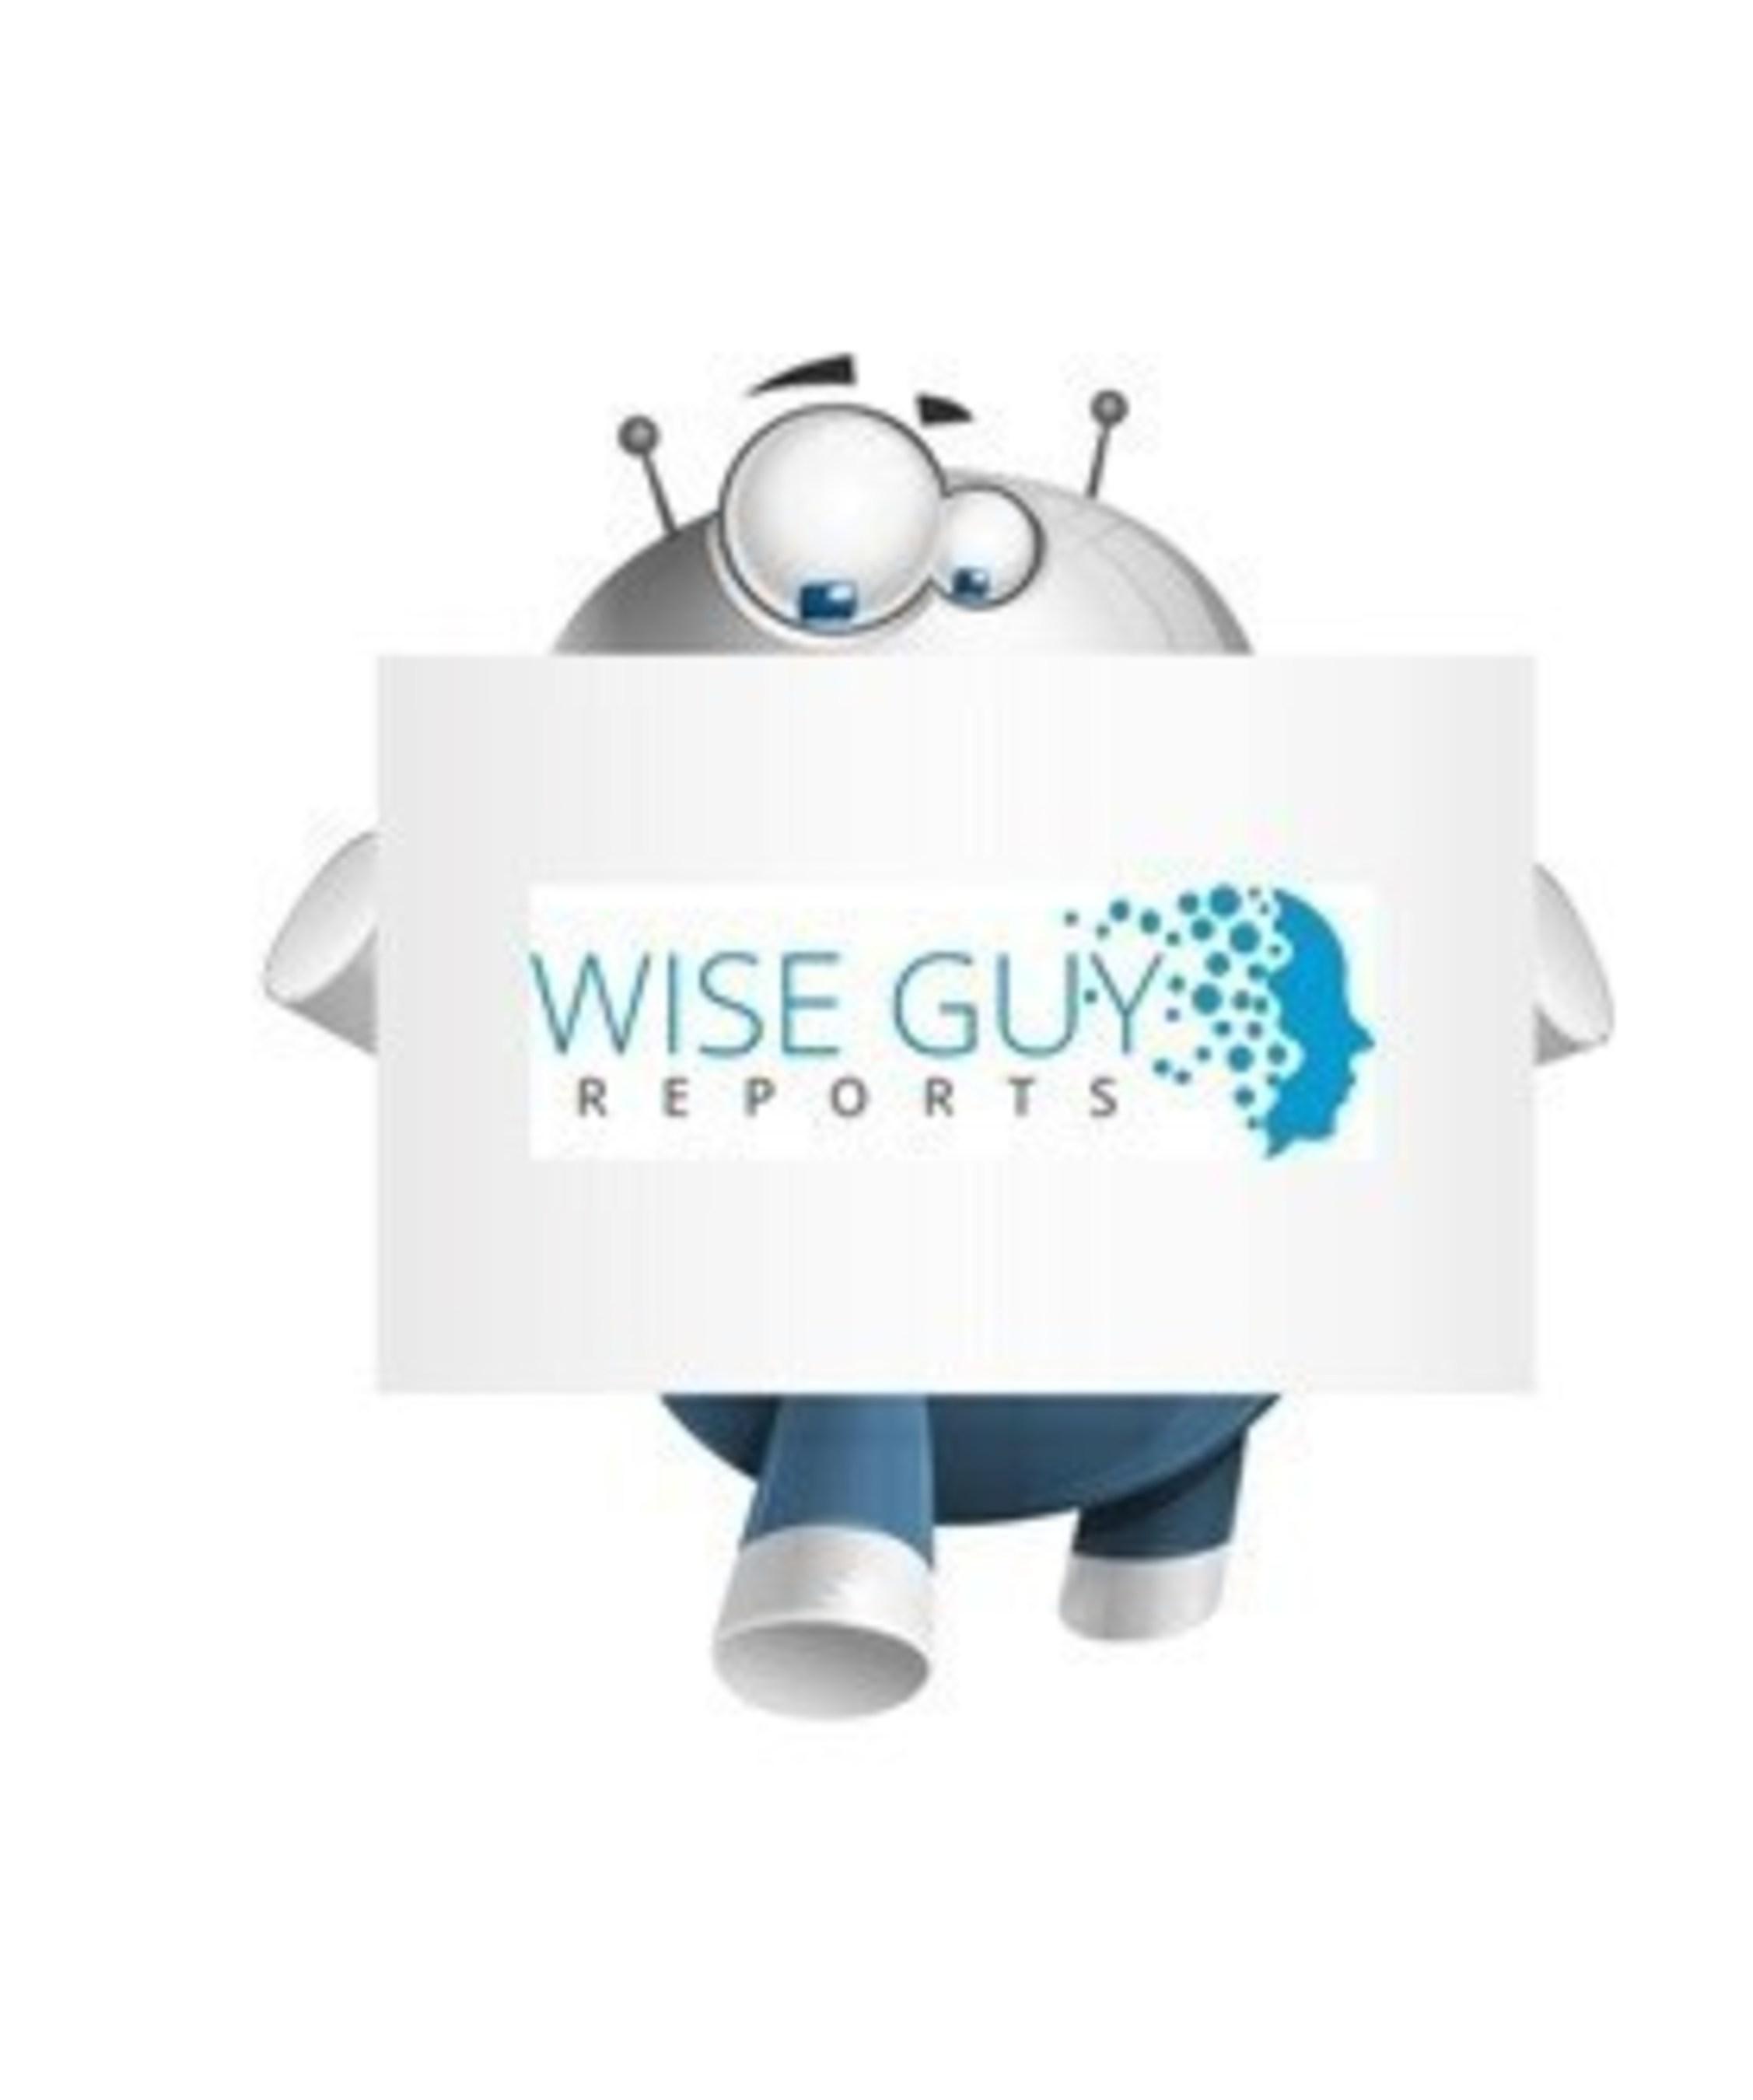 2G, 3G, 4G & 5G Wireless Network Infrastructure Market 2016 to 2030 - Analysis of 434 Major Companies Worldwide